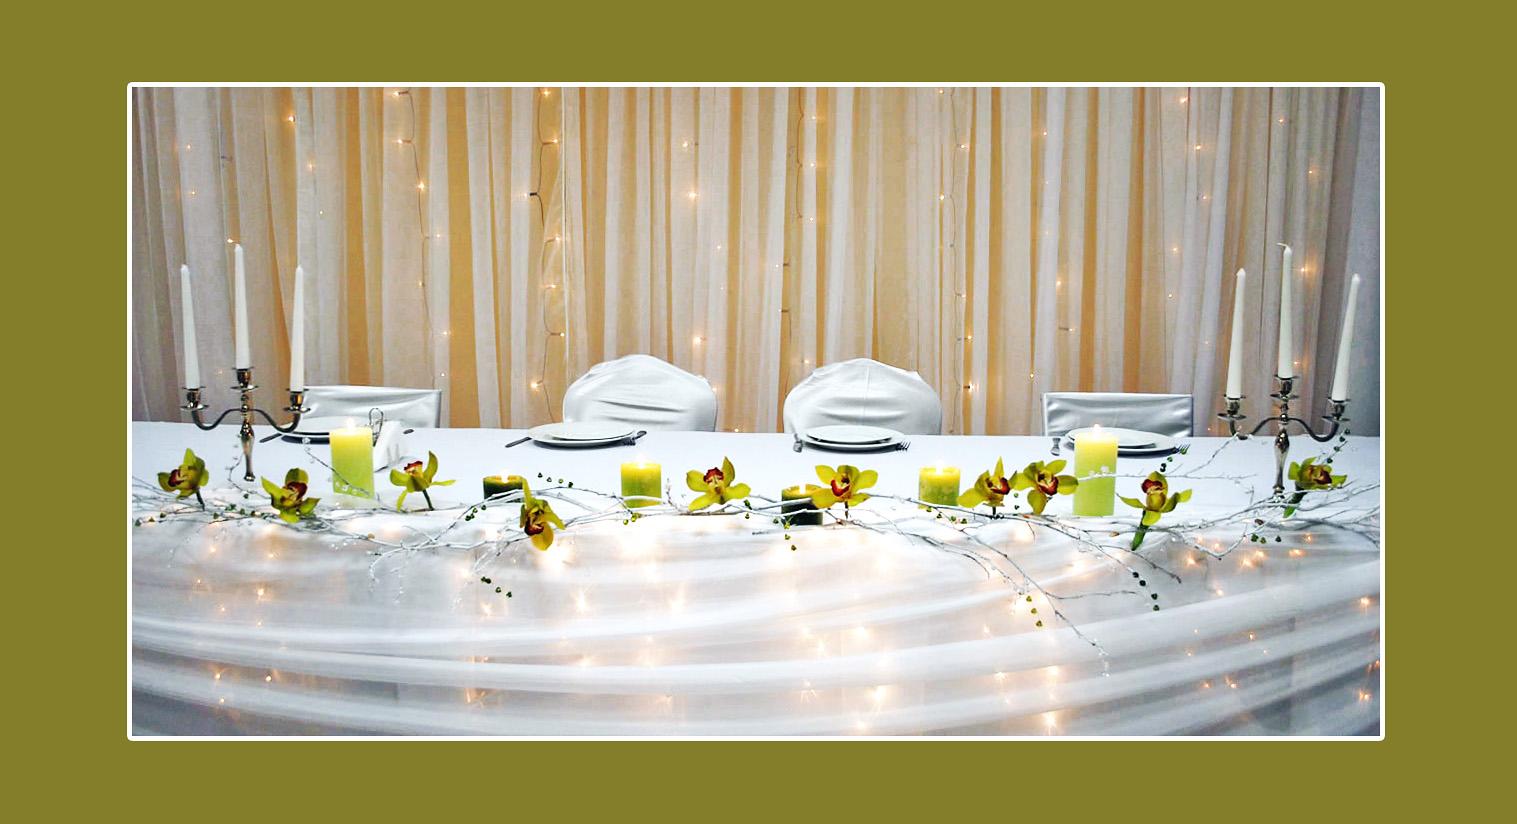 Deko mit Kommunionskerzen  Tischdekotips